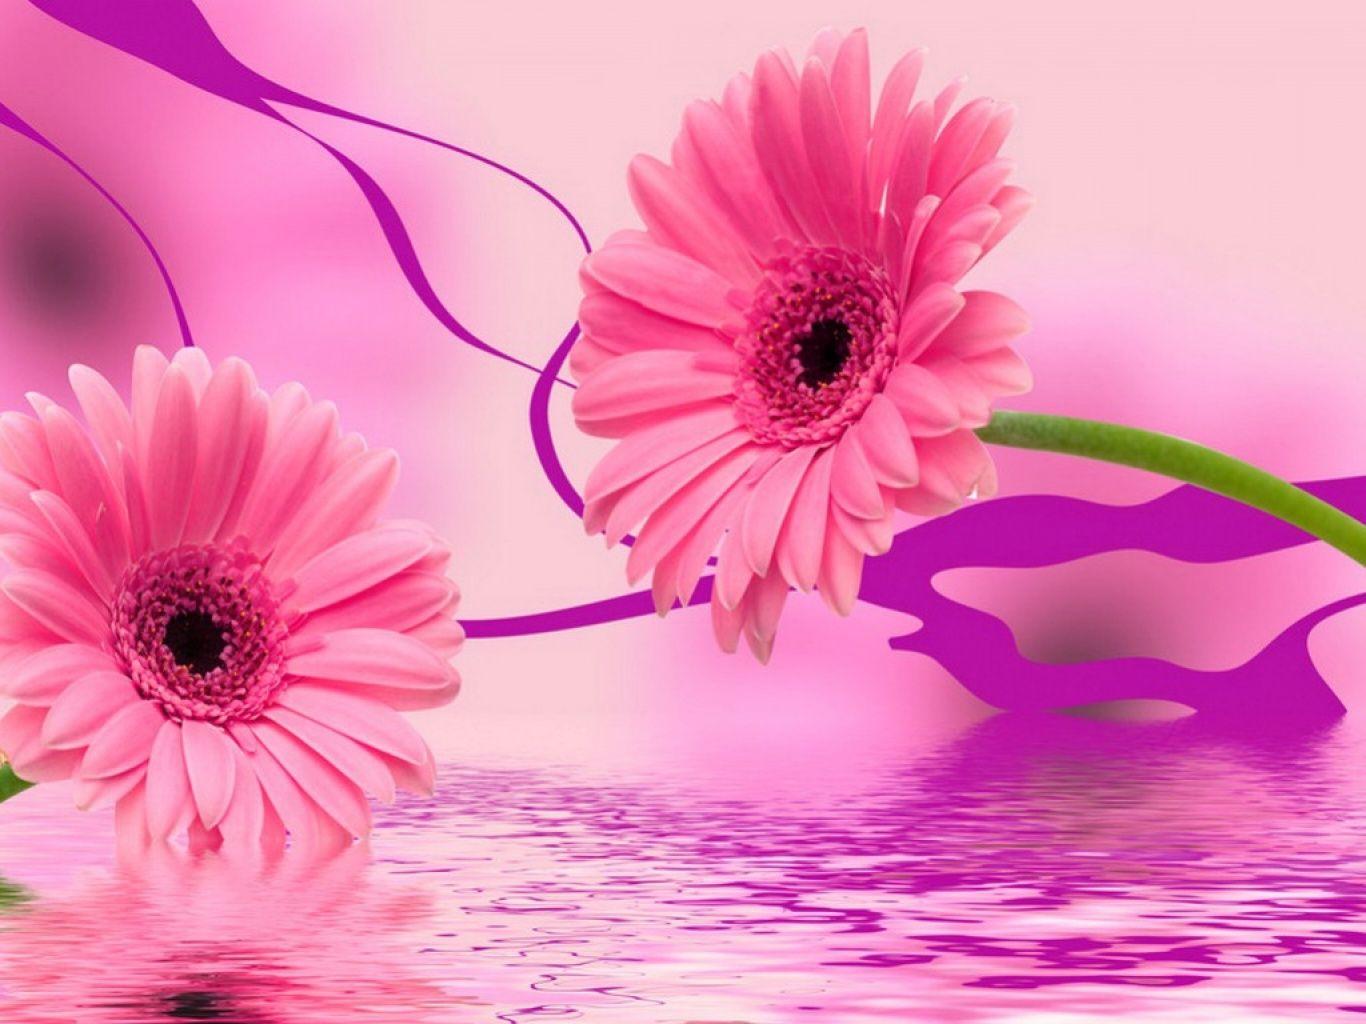 Margaritas rosadas | rosa